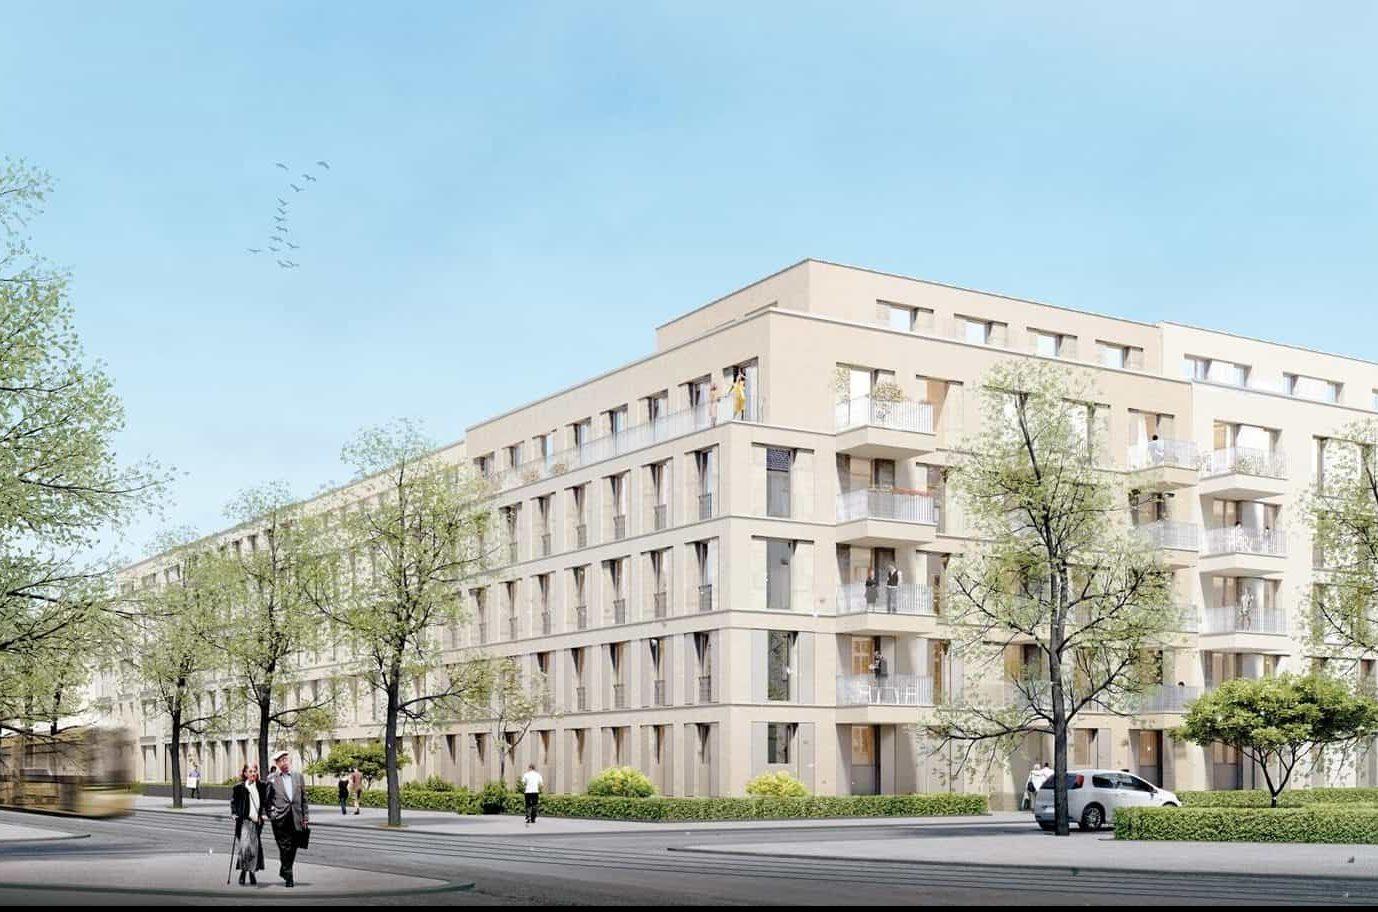 Wohnkomplex Pankow Berlin Fliesendesign